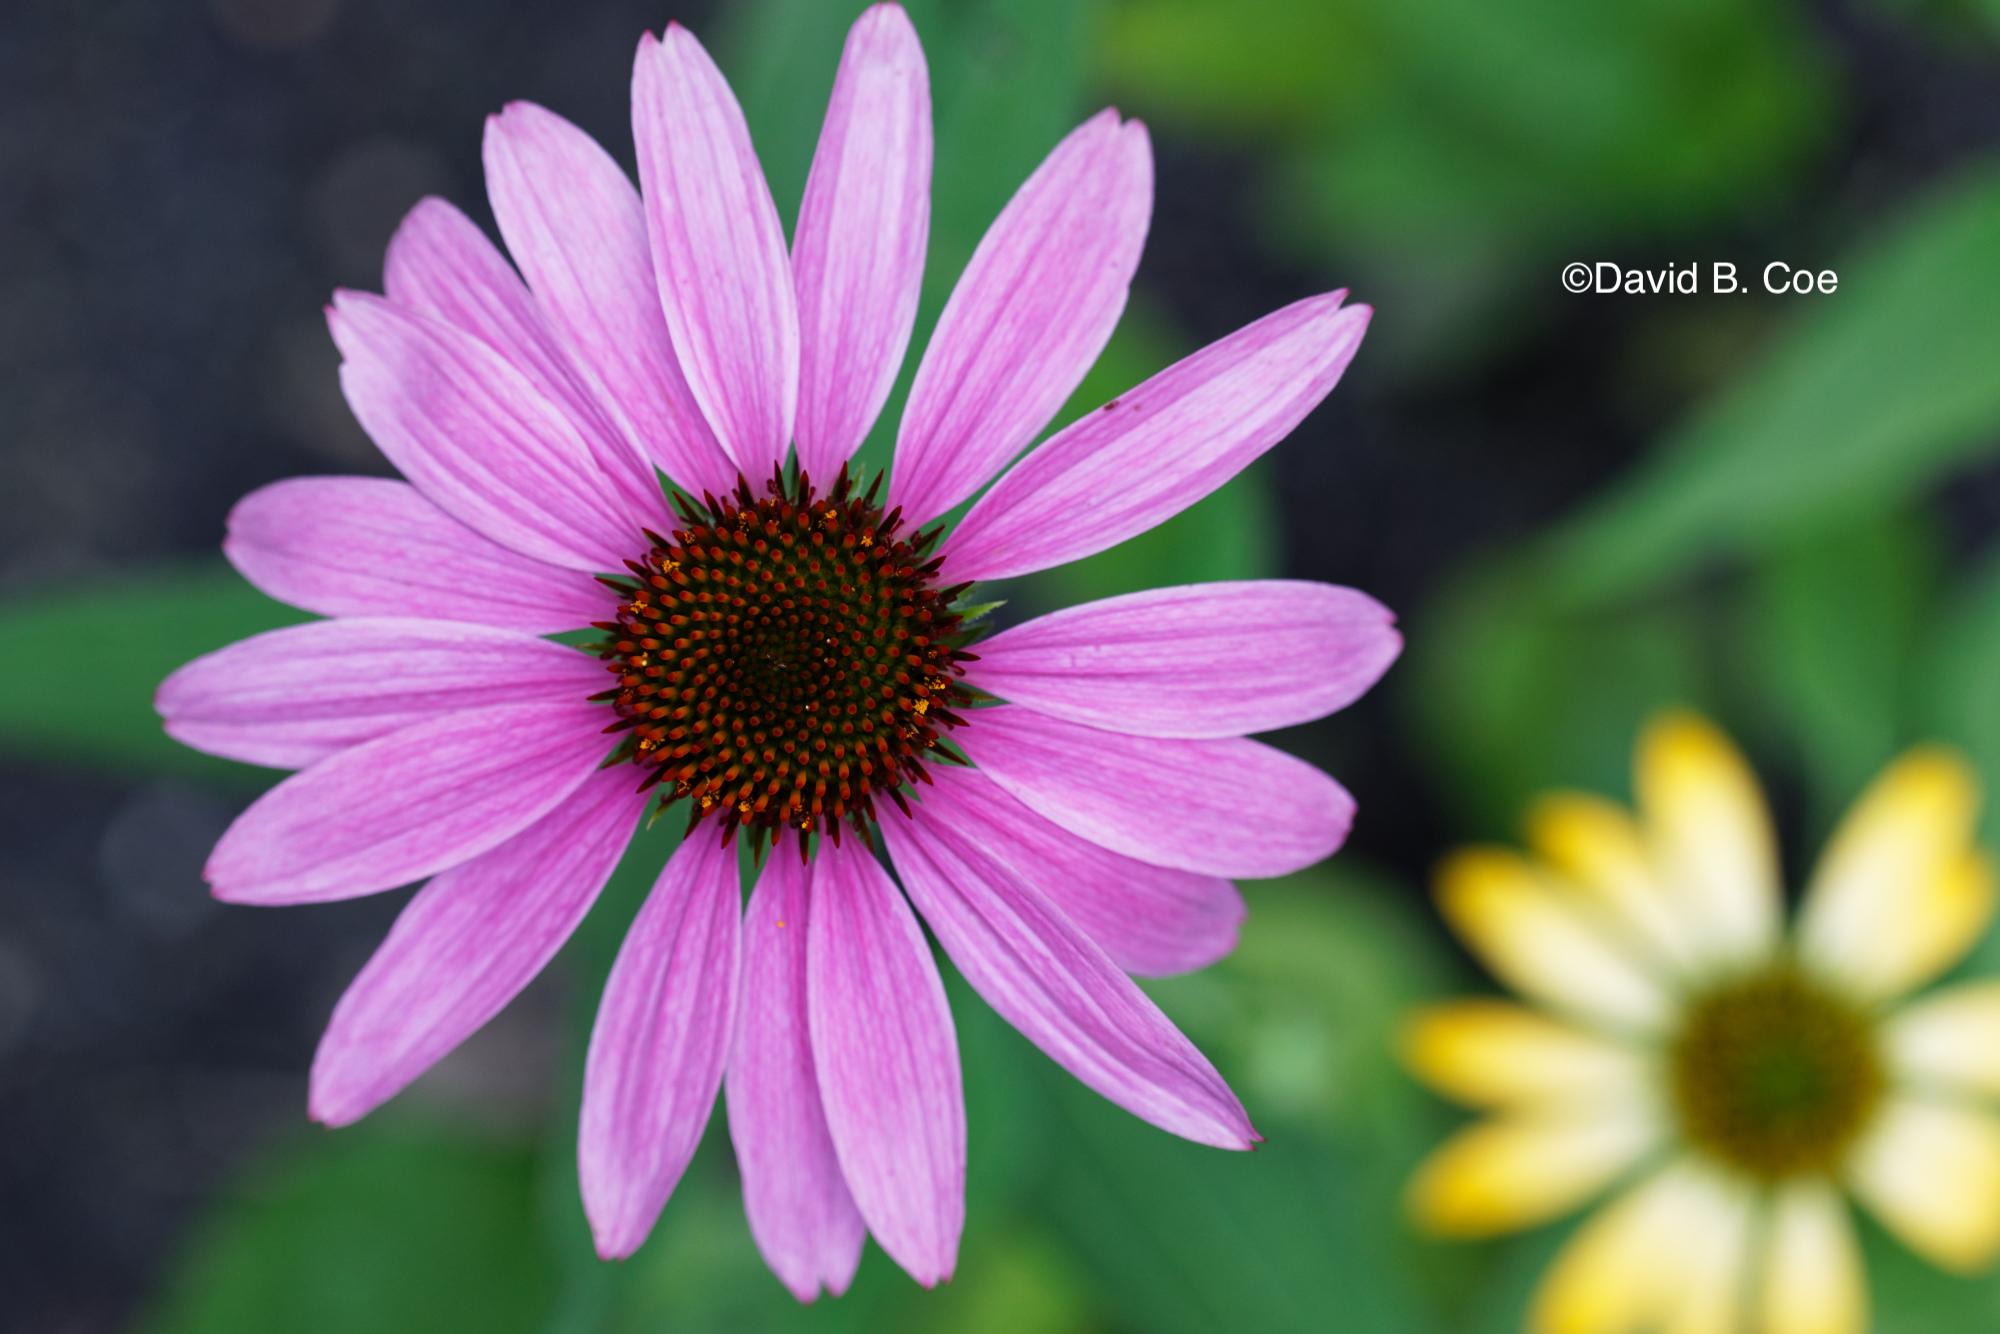 Echinacea, by David B. Coe